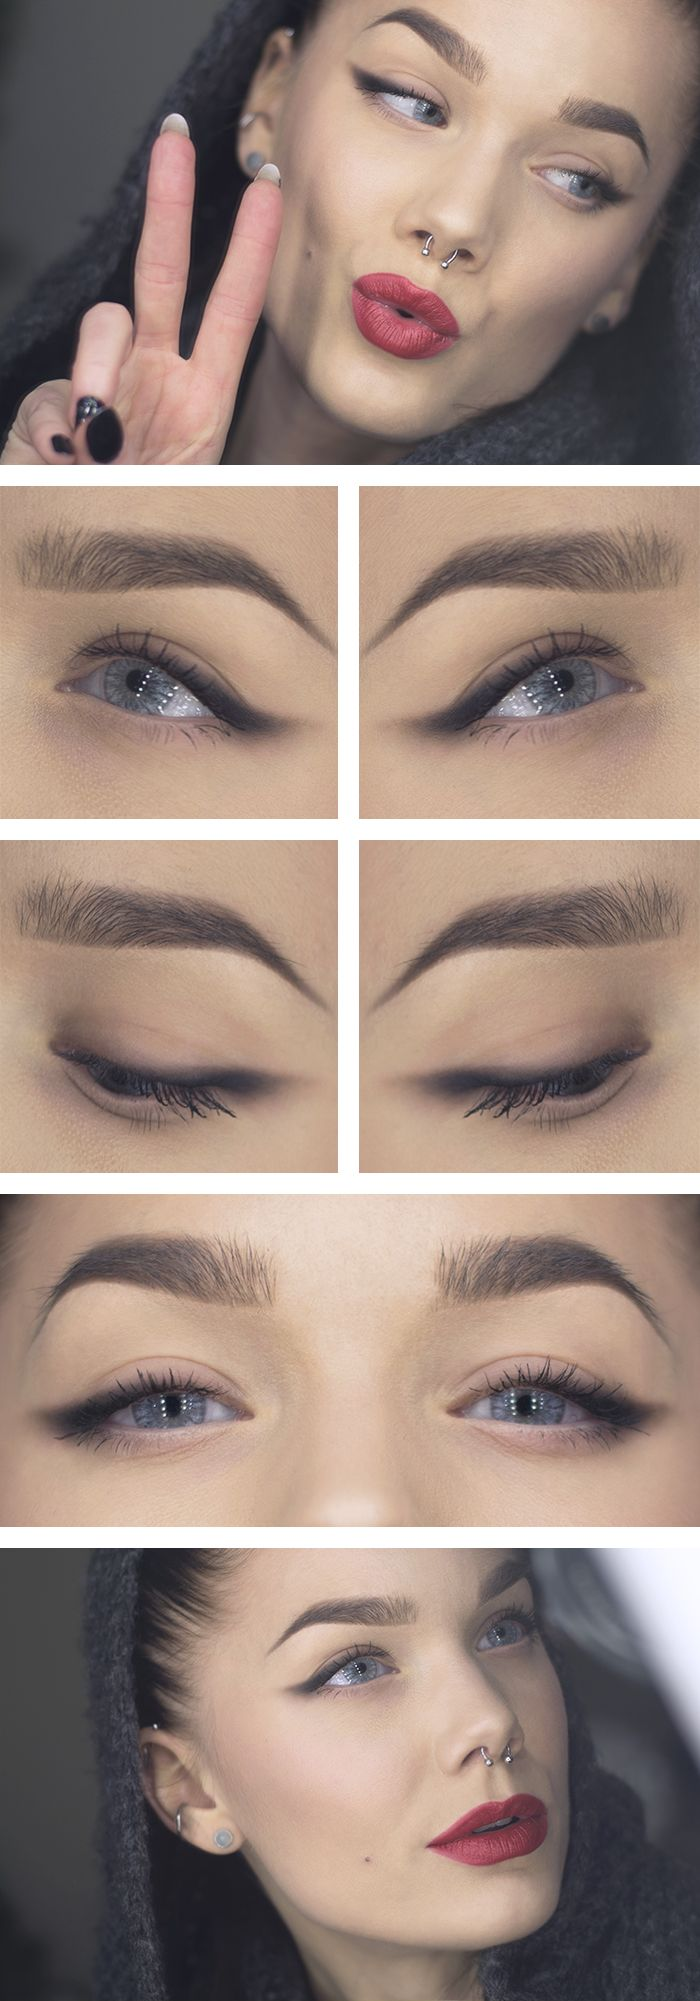 "Today's Look : ""Keep it Simple"" -Linda Hallberg (black eyeshadow applied and smudged as eyeliner, bold red lips) 01/06/14"